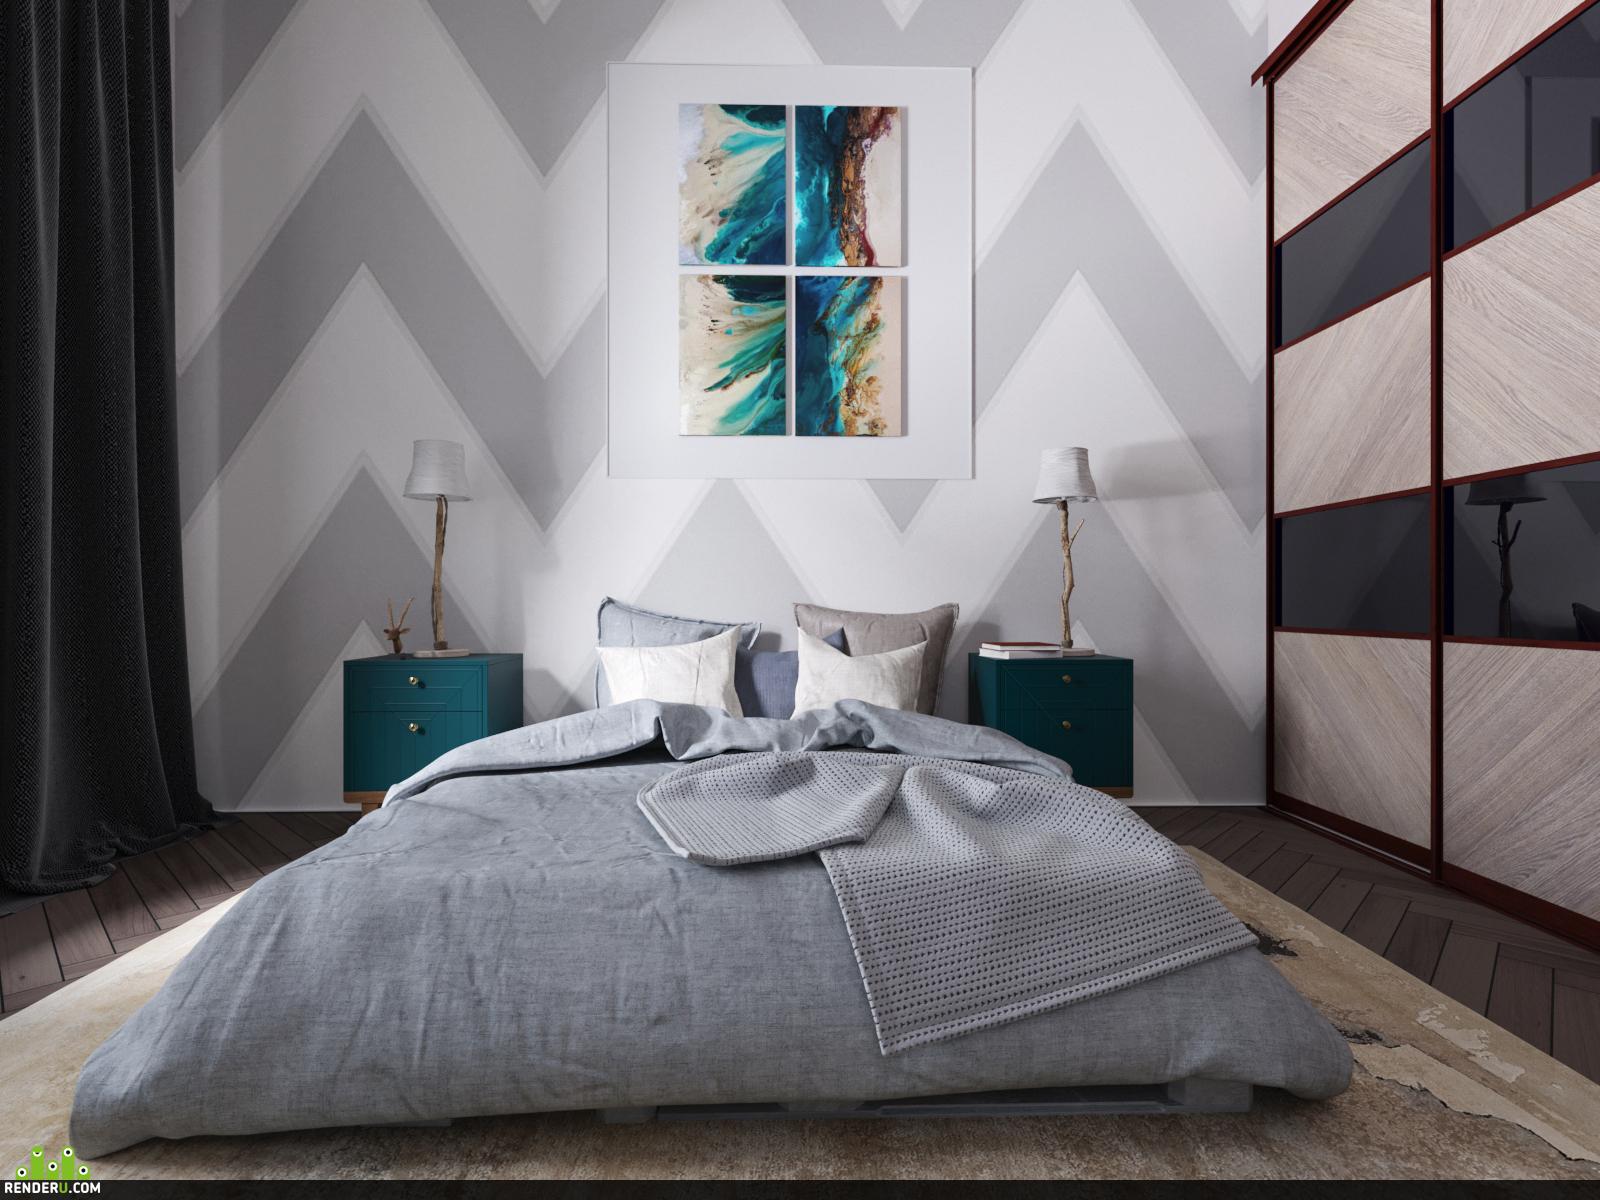 preview Bedroom